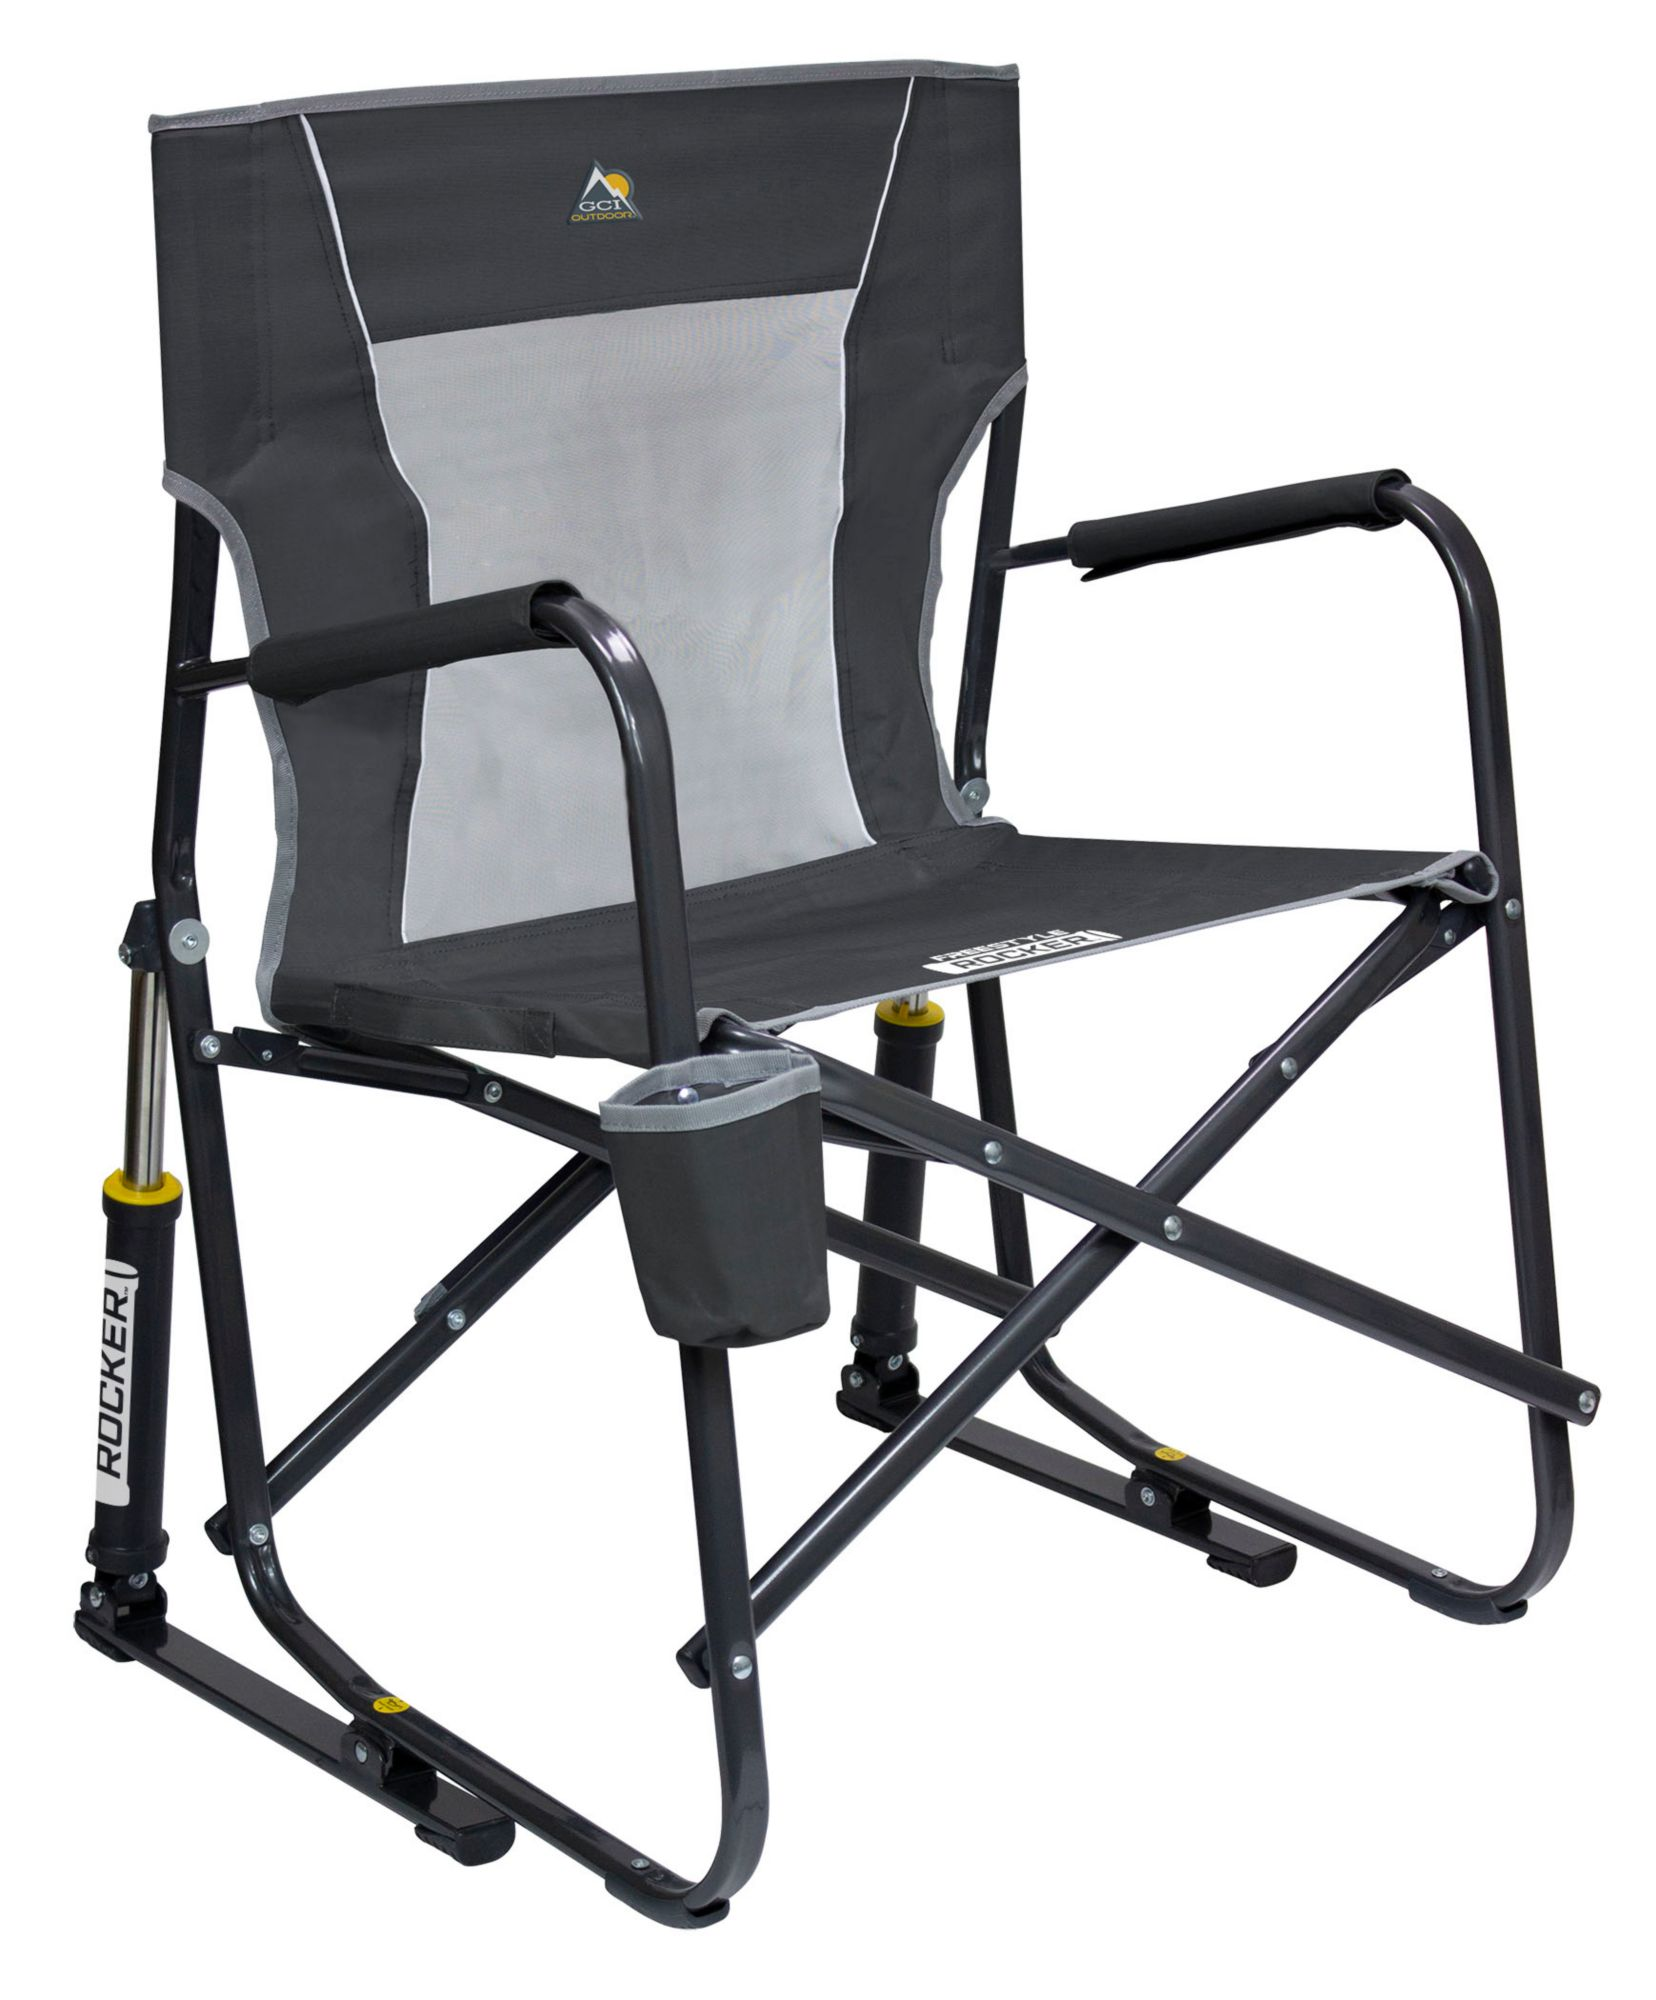 Gci Outdoor Freestyle Rocker Mesh Chair by Gci Outdoor